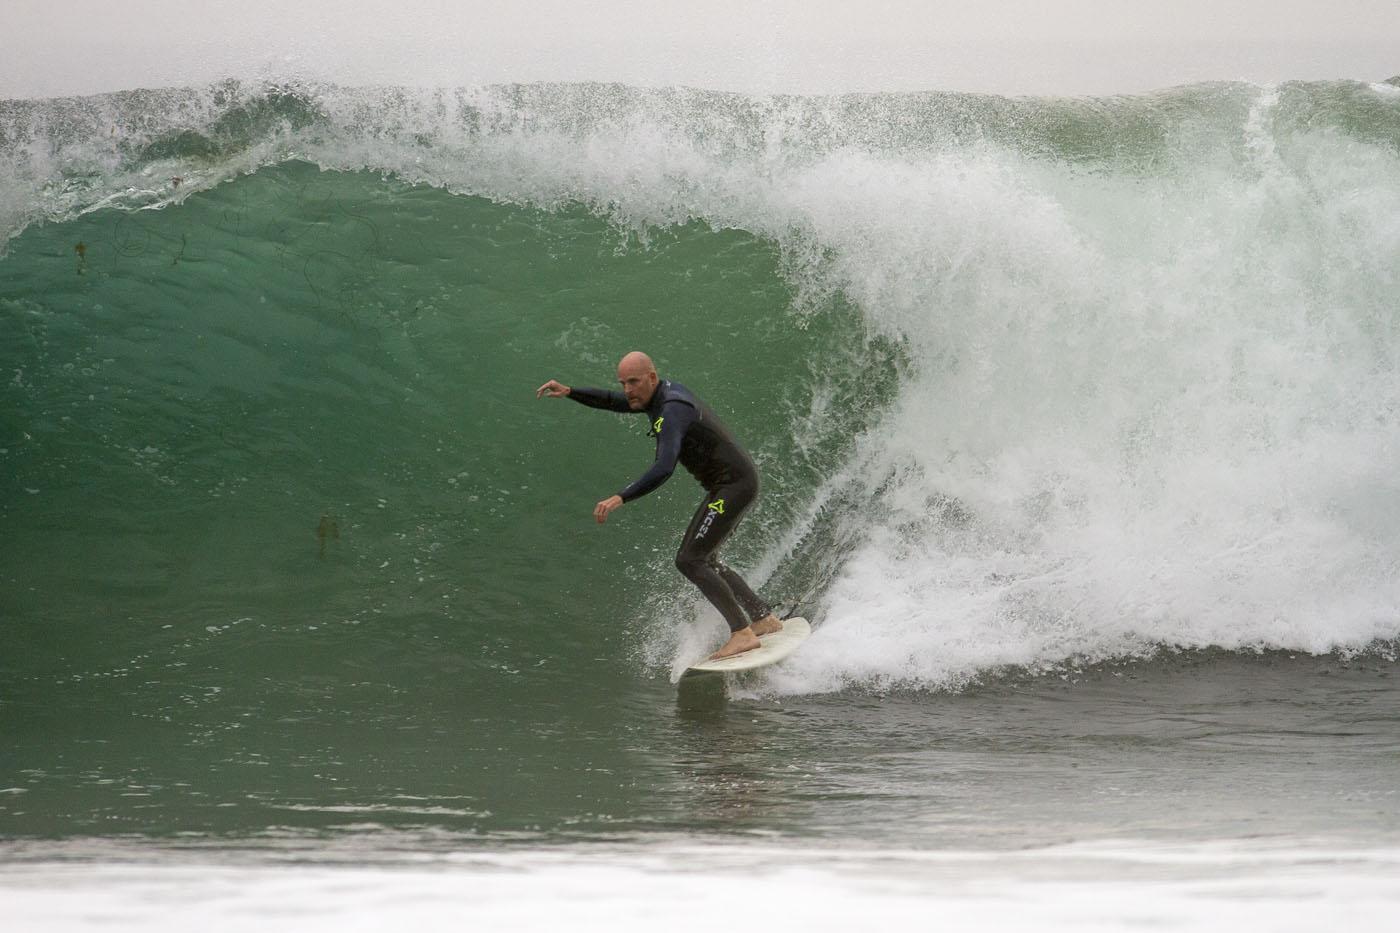 Surfing Conditions Laguna Beach